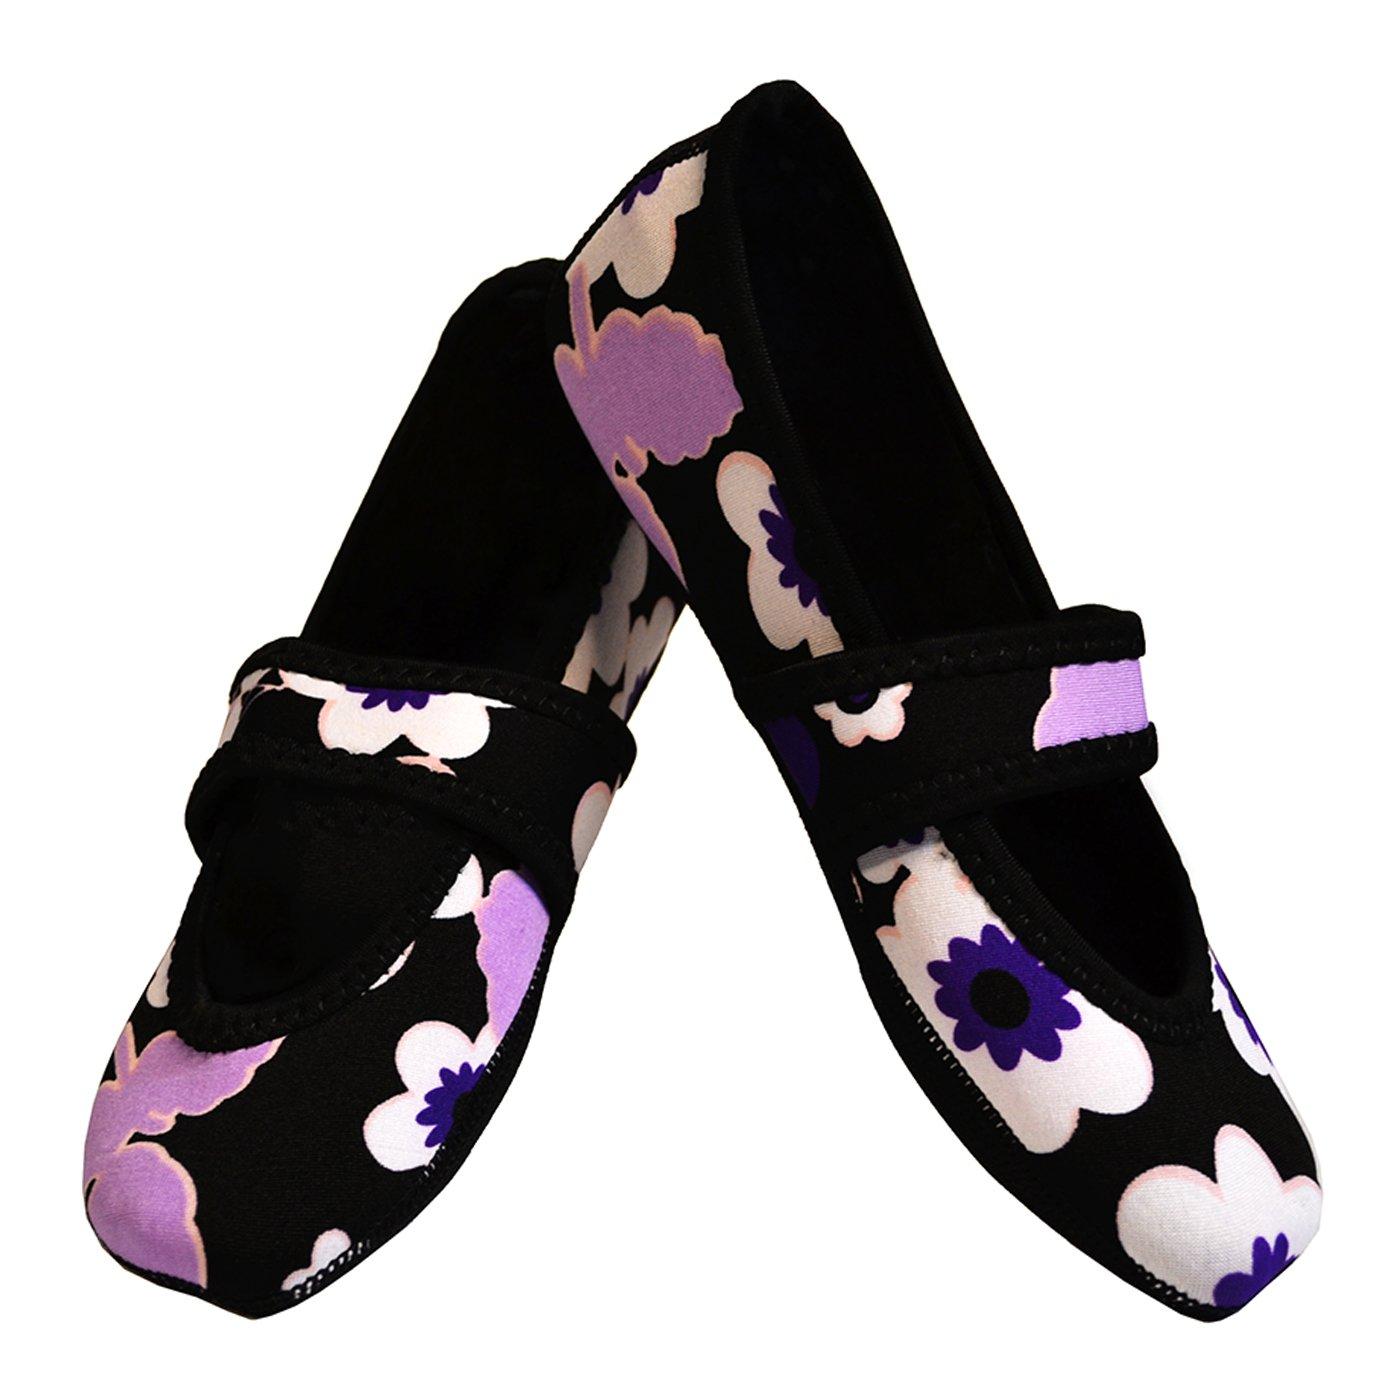 Nufoot Betsy Lou Women's Shoes, Best Foldable & Flexible Flats, Slipper Socks, Travel Slippers & Exercise Shoes, Dance Shoes, Yoga Socks, House Shoes, Indoor Slippers, Purple Flowers, Large